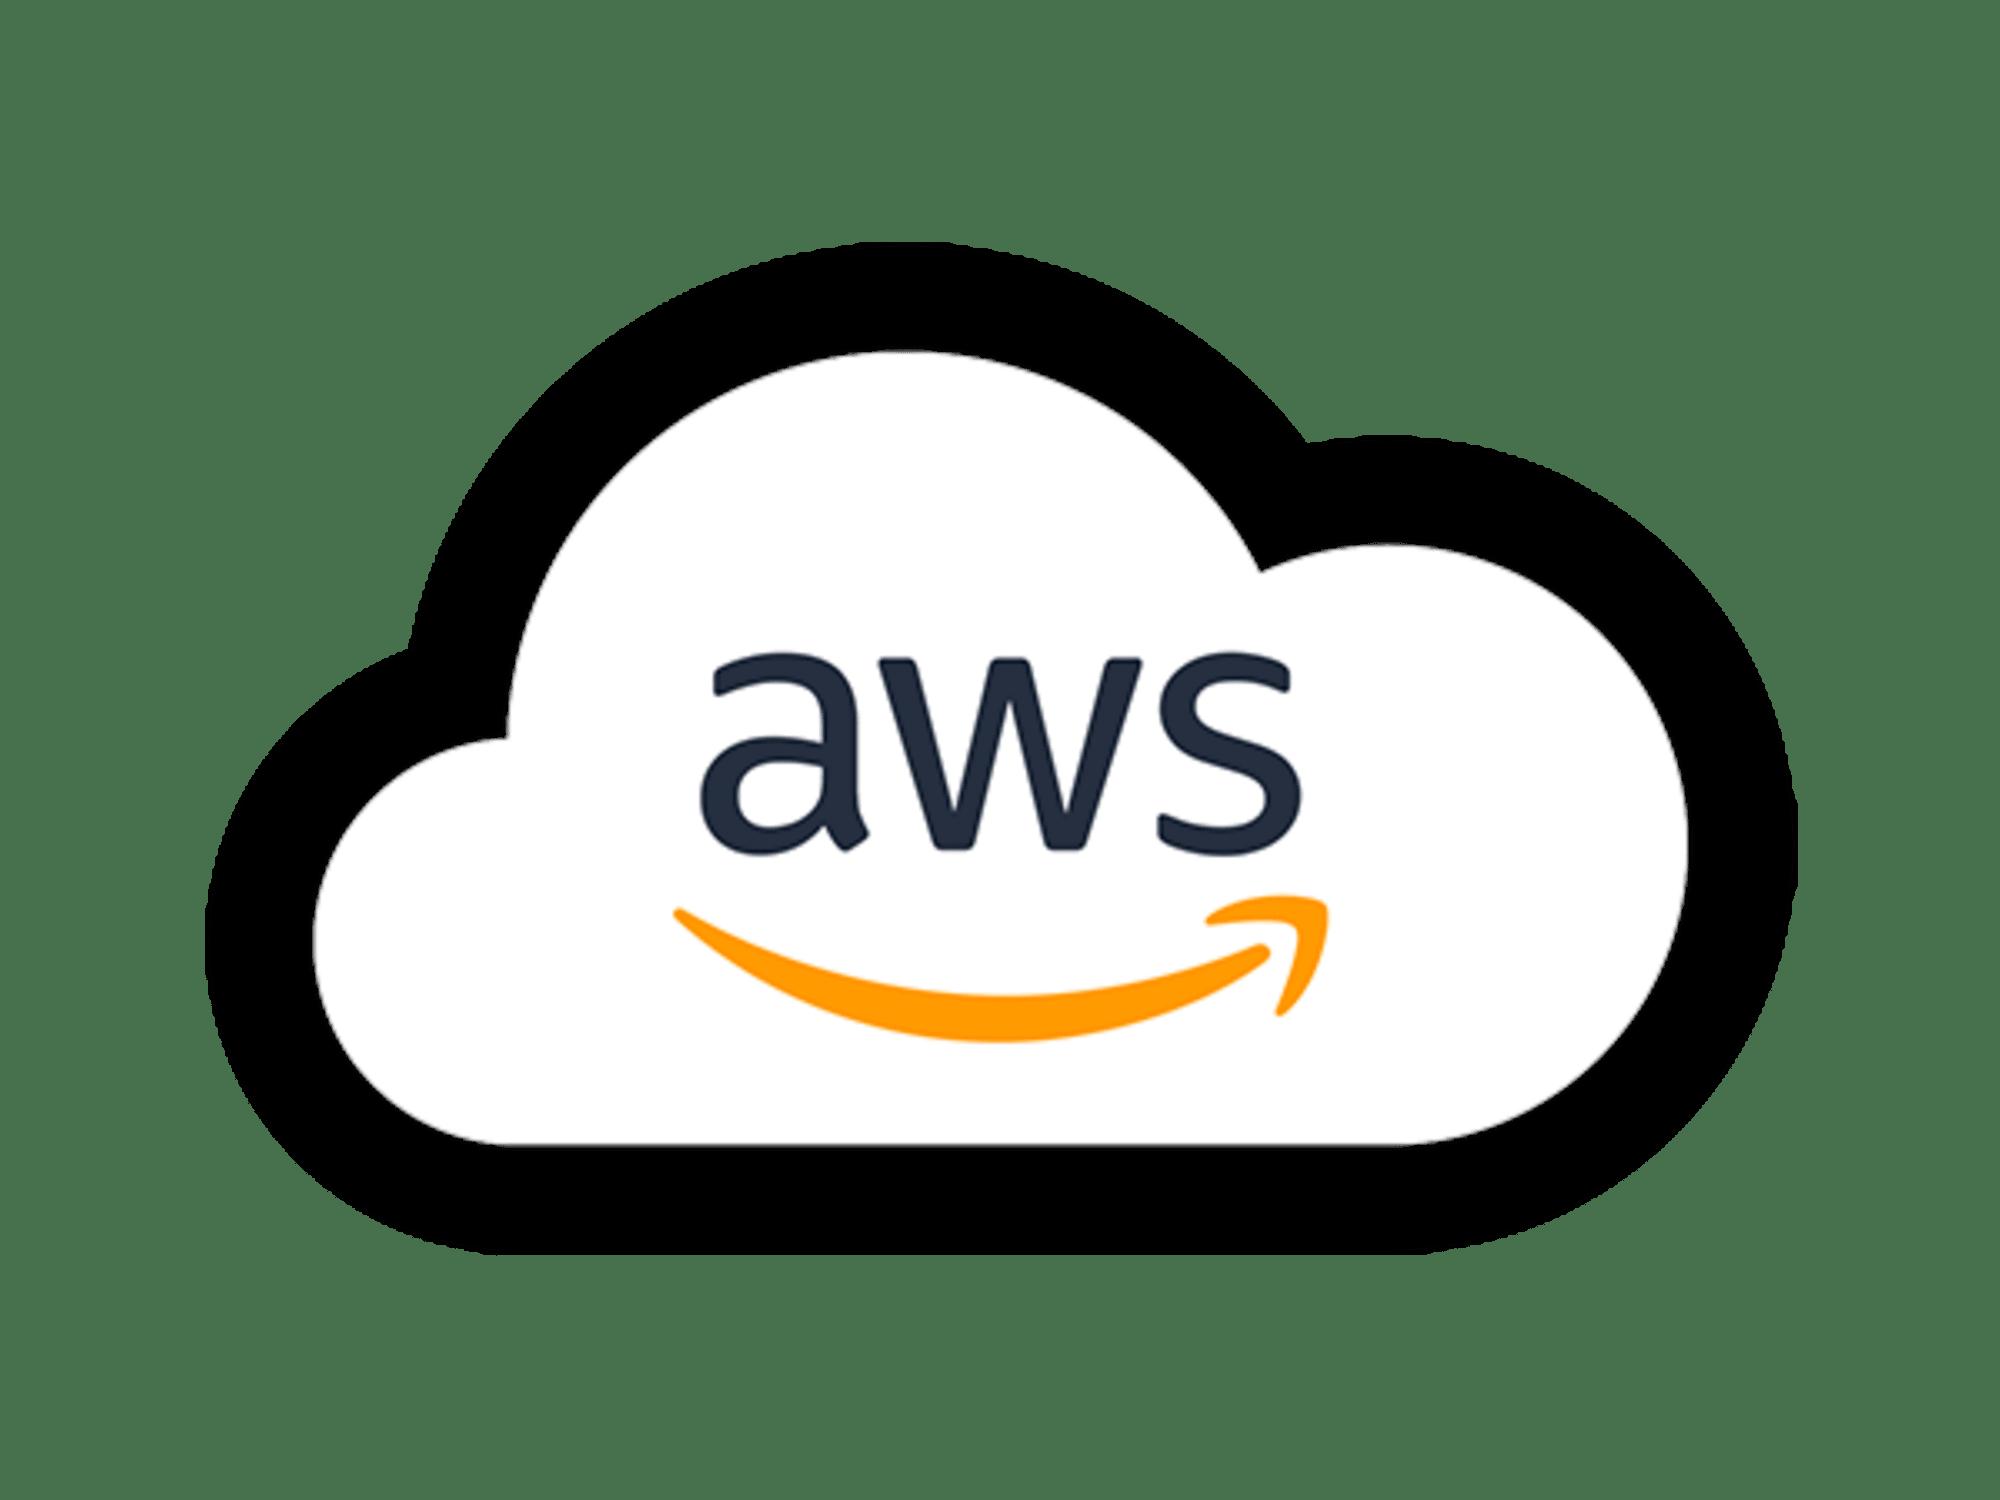 aws-logo - Futurum Research